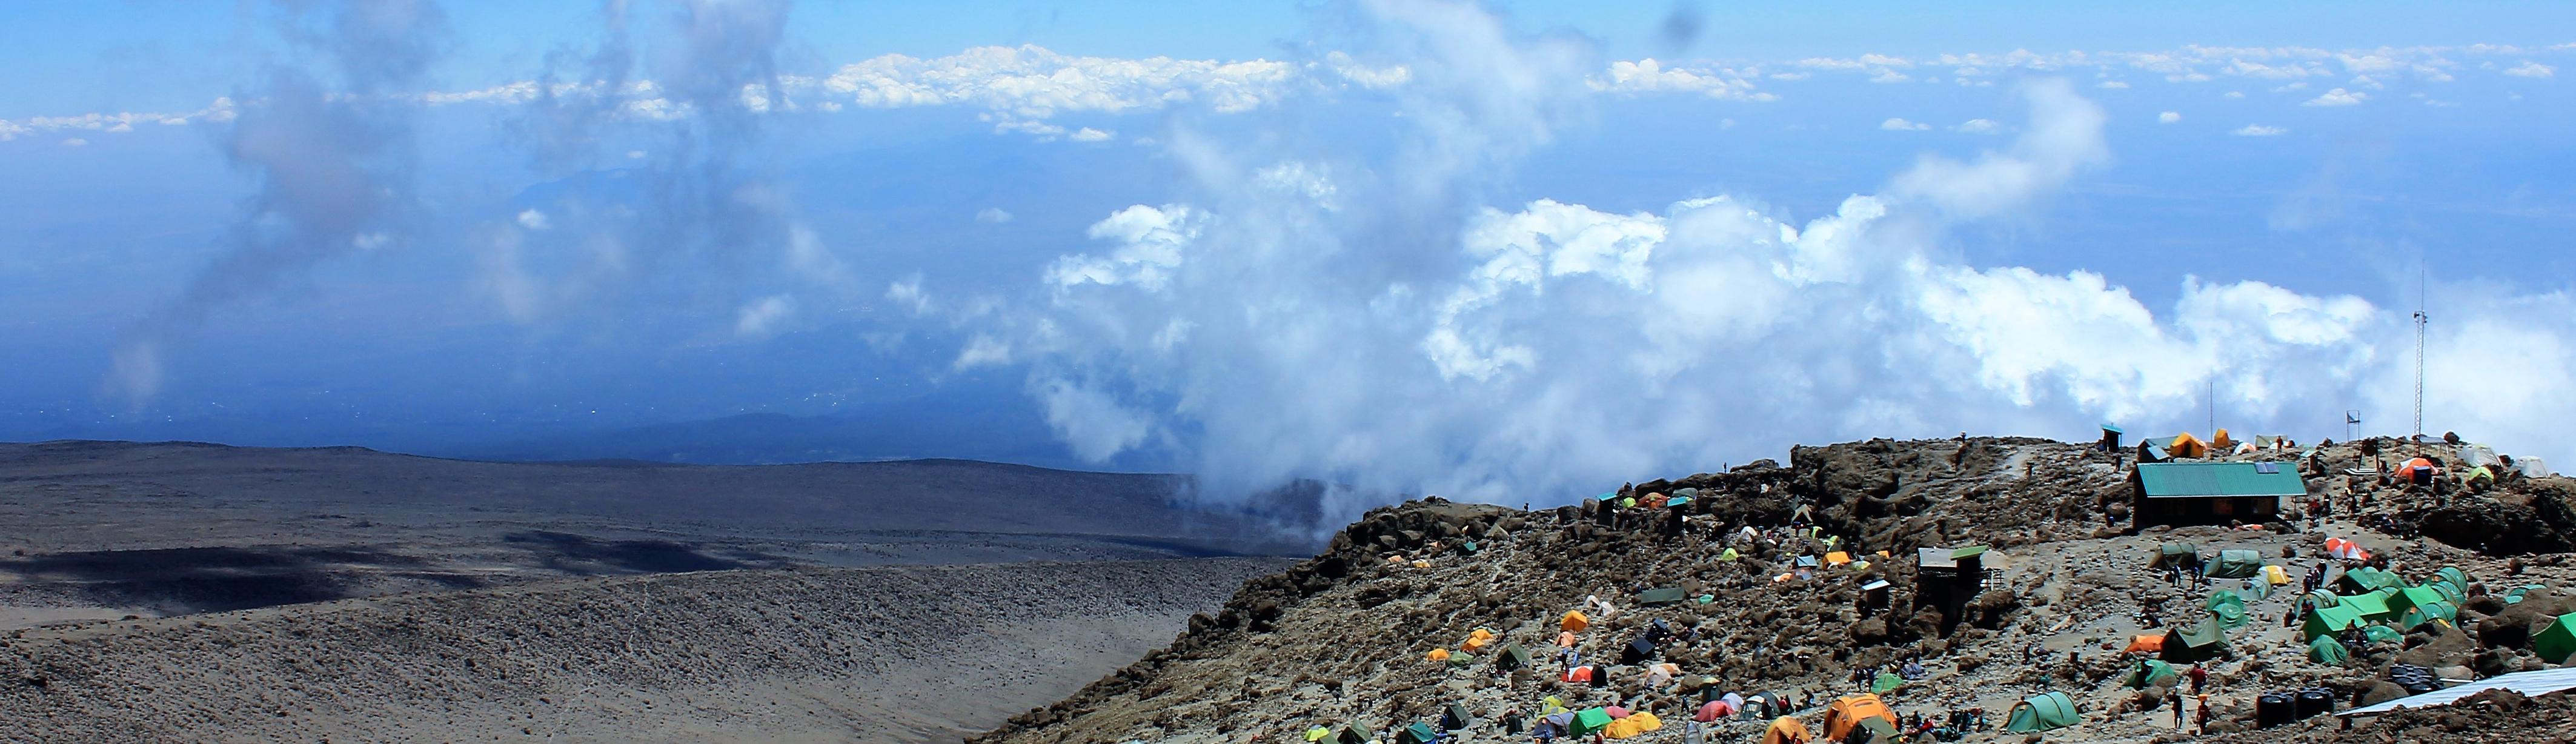 Kilimanjaro Expedition